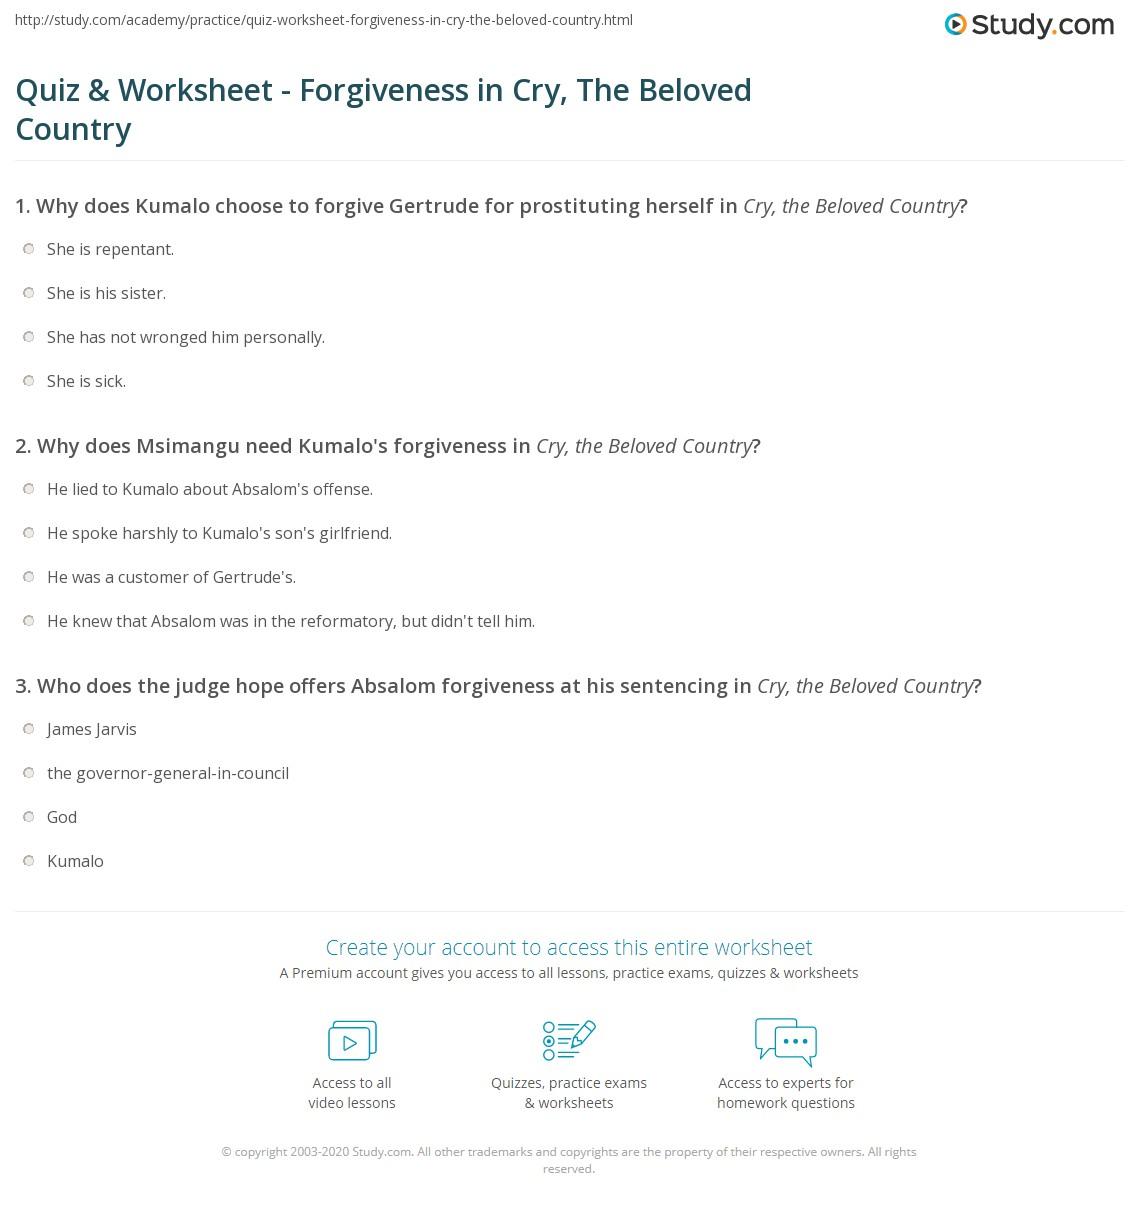 Free Worksheet Forgiveness Worksheets spincushion Worksheets – Forgiveness Worksheet